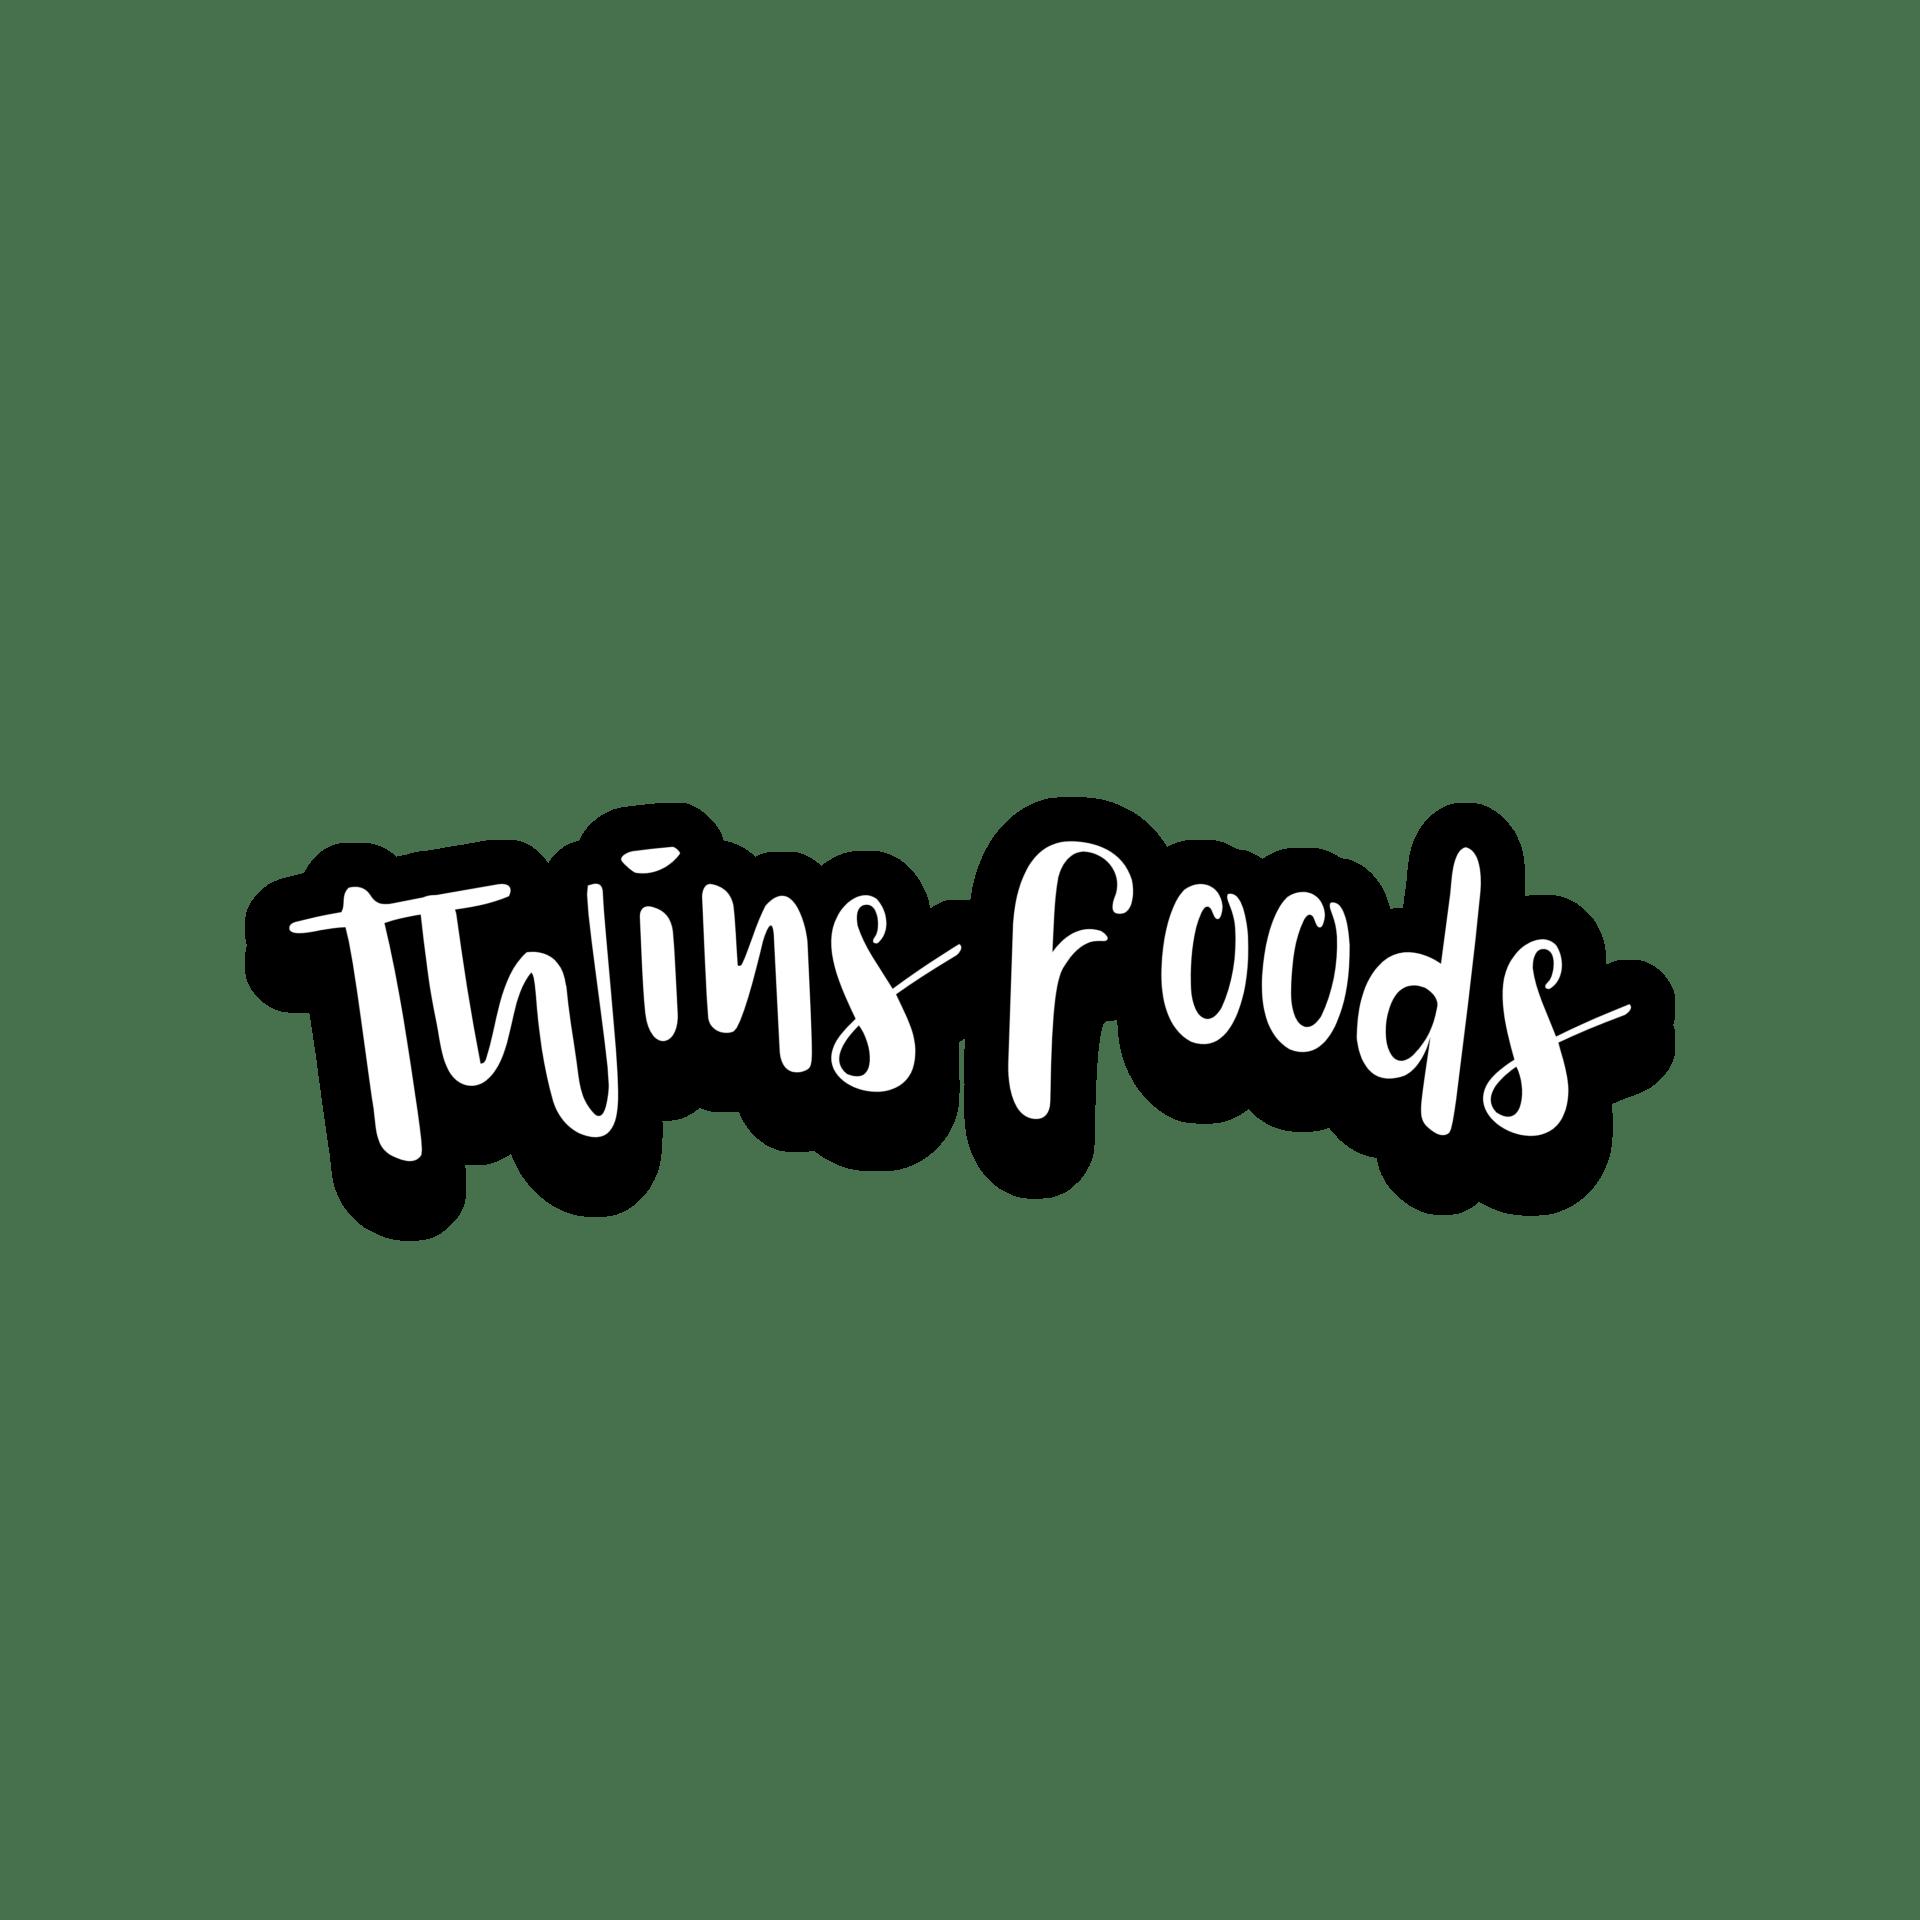 Twins Foods